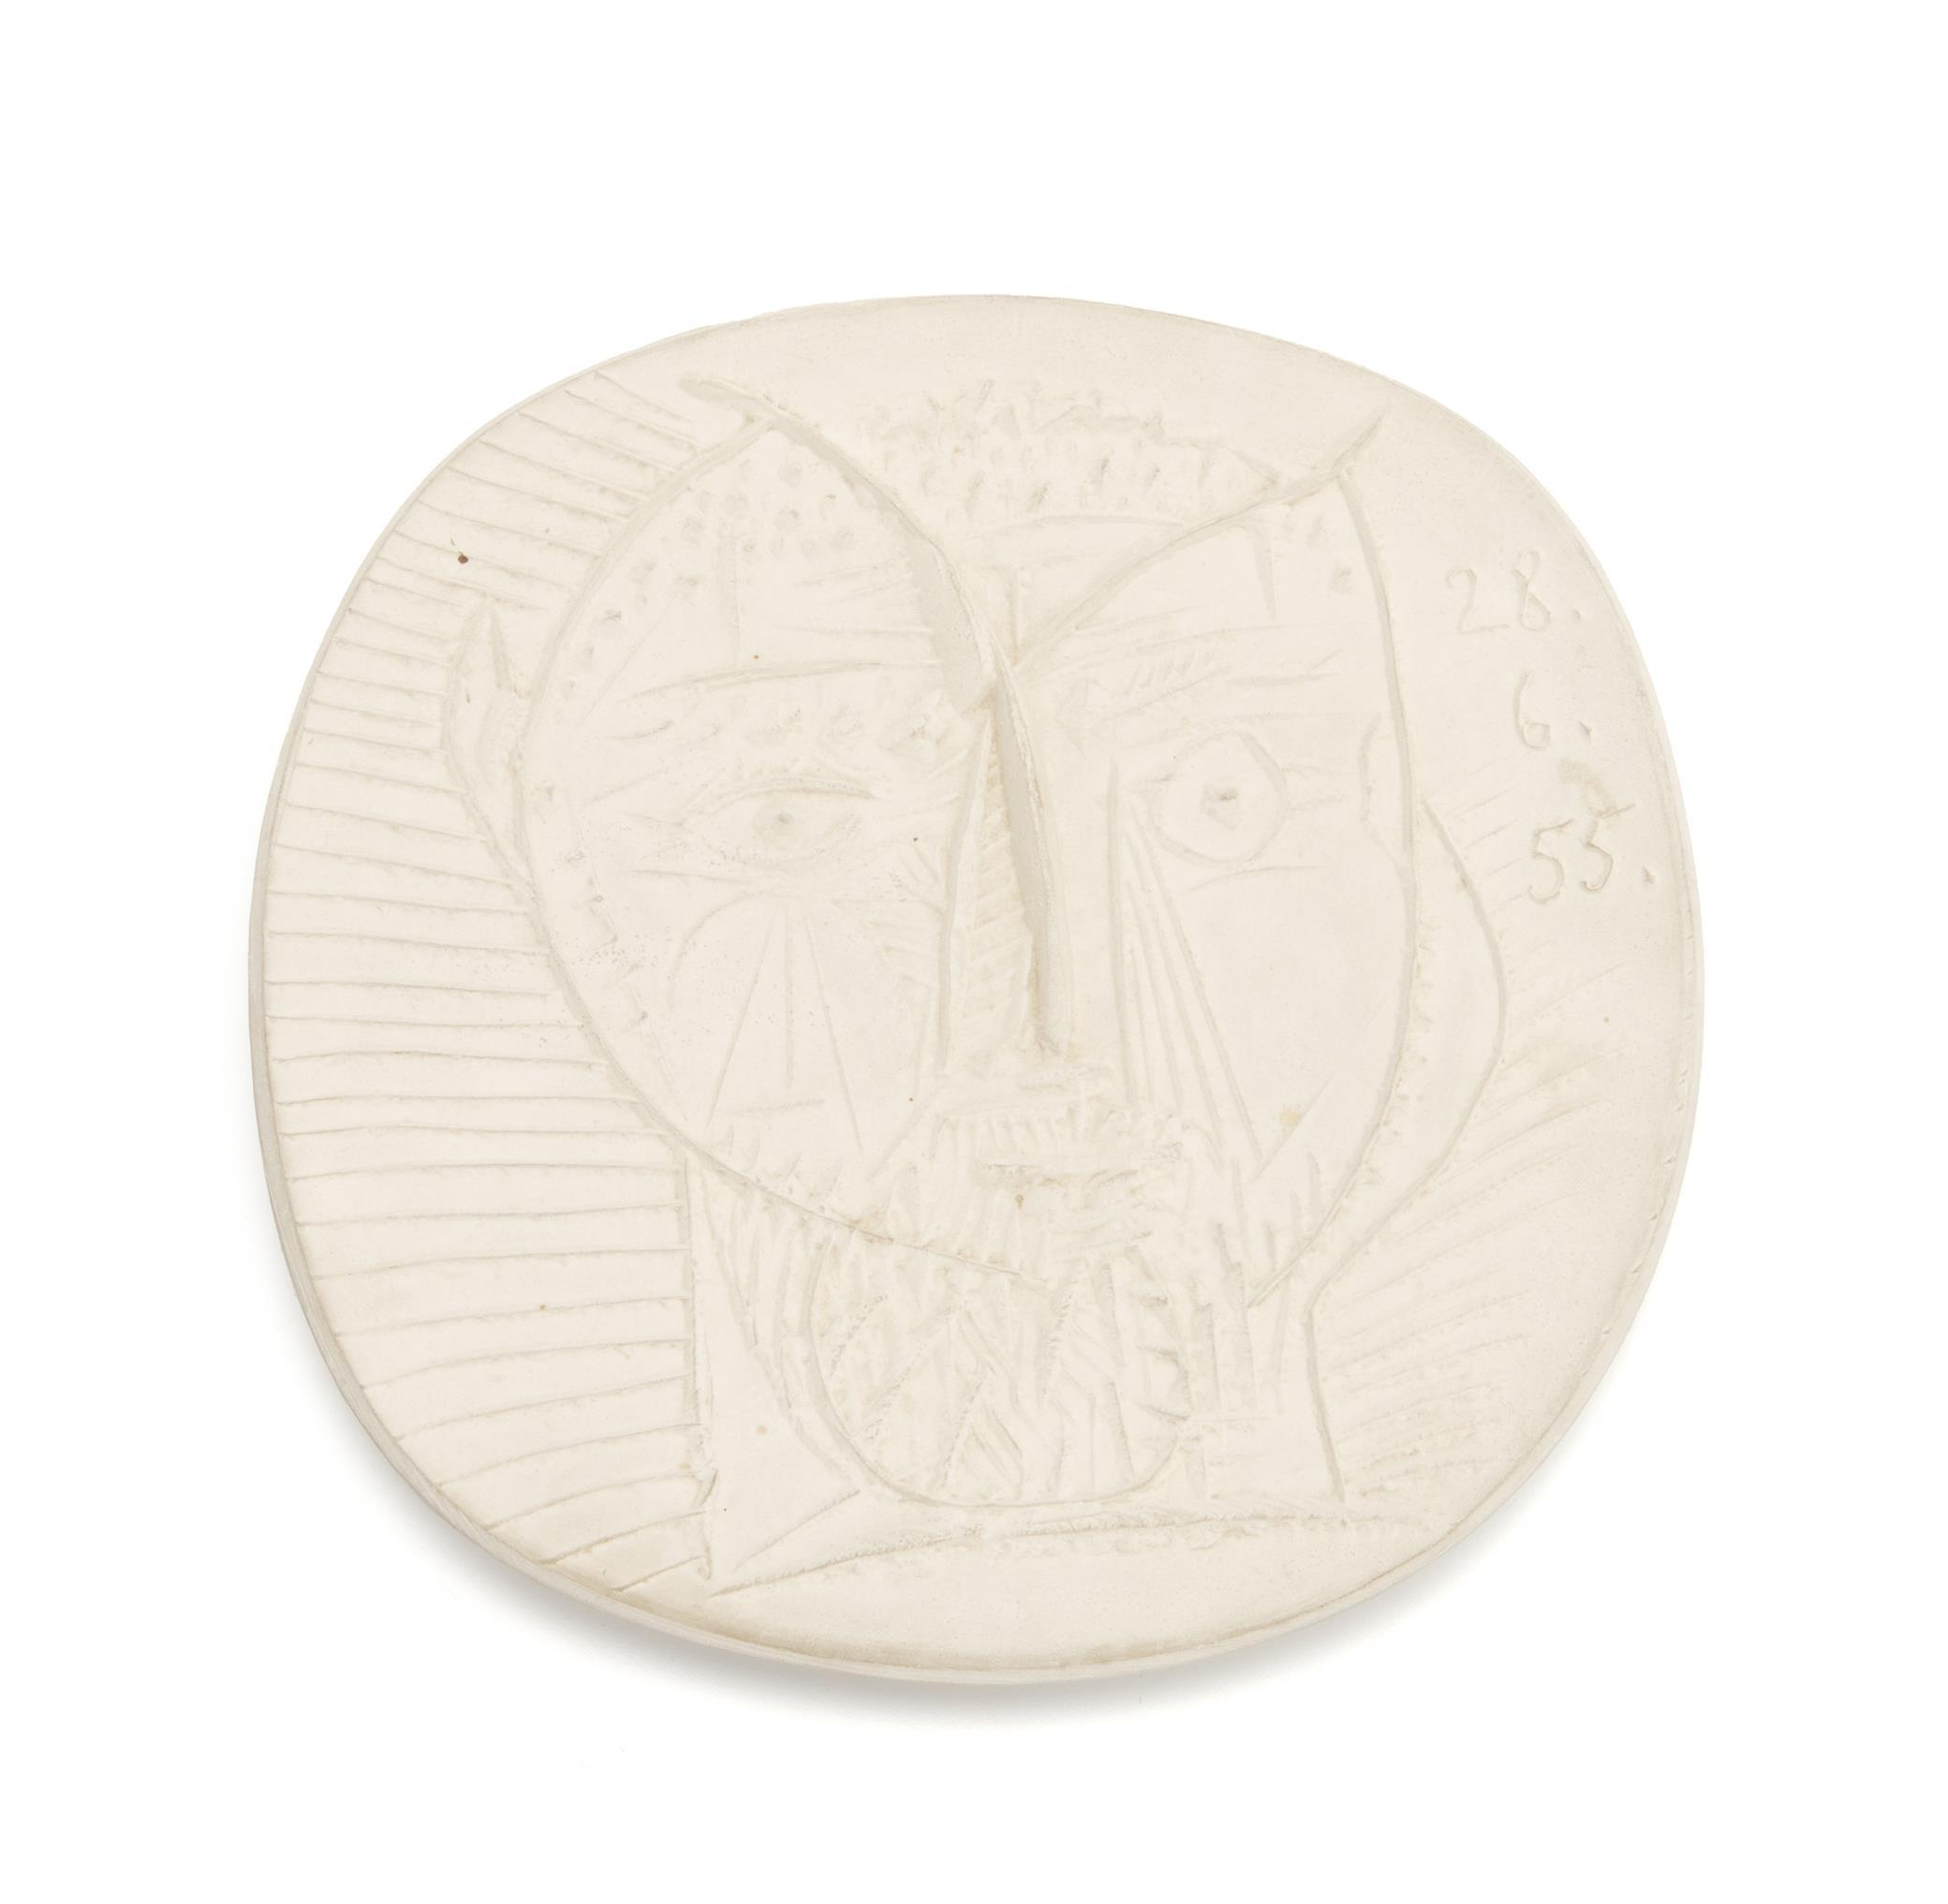 "Pablo Picasso, (1881-1973, Spanish), ""Faun's Head,"" 1955, White earthenware clay, 1"" H x 10"" W x 10"" D"